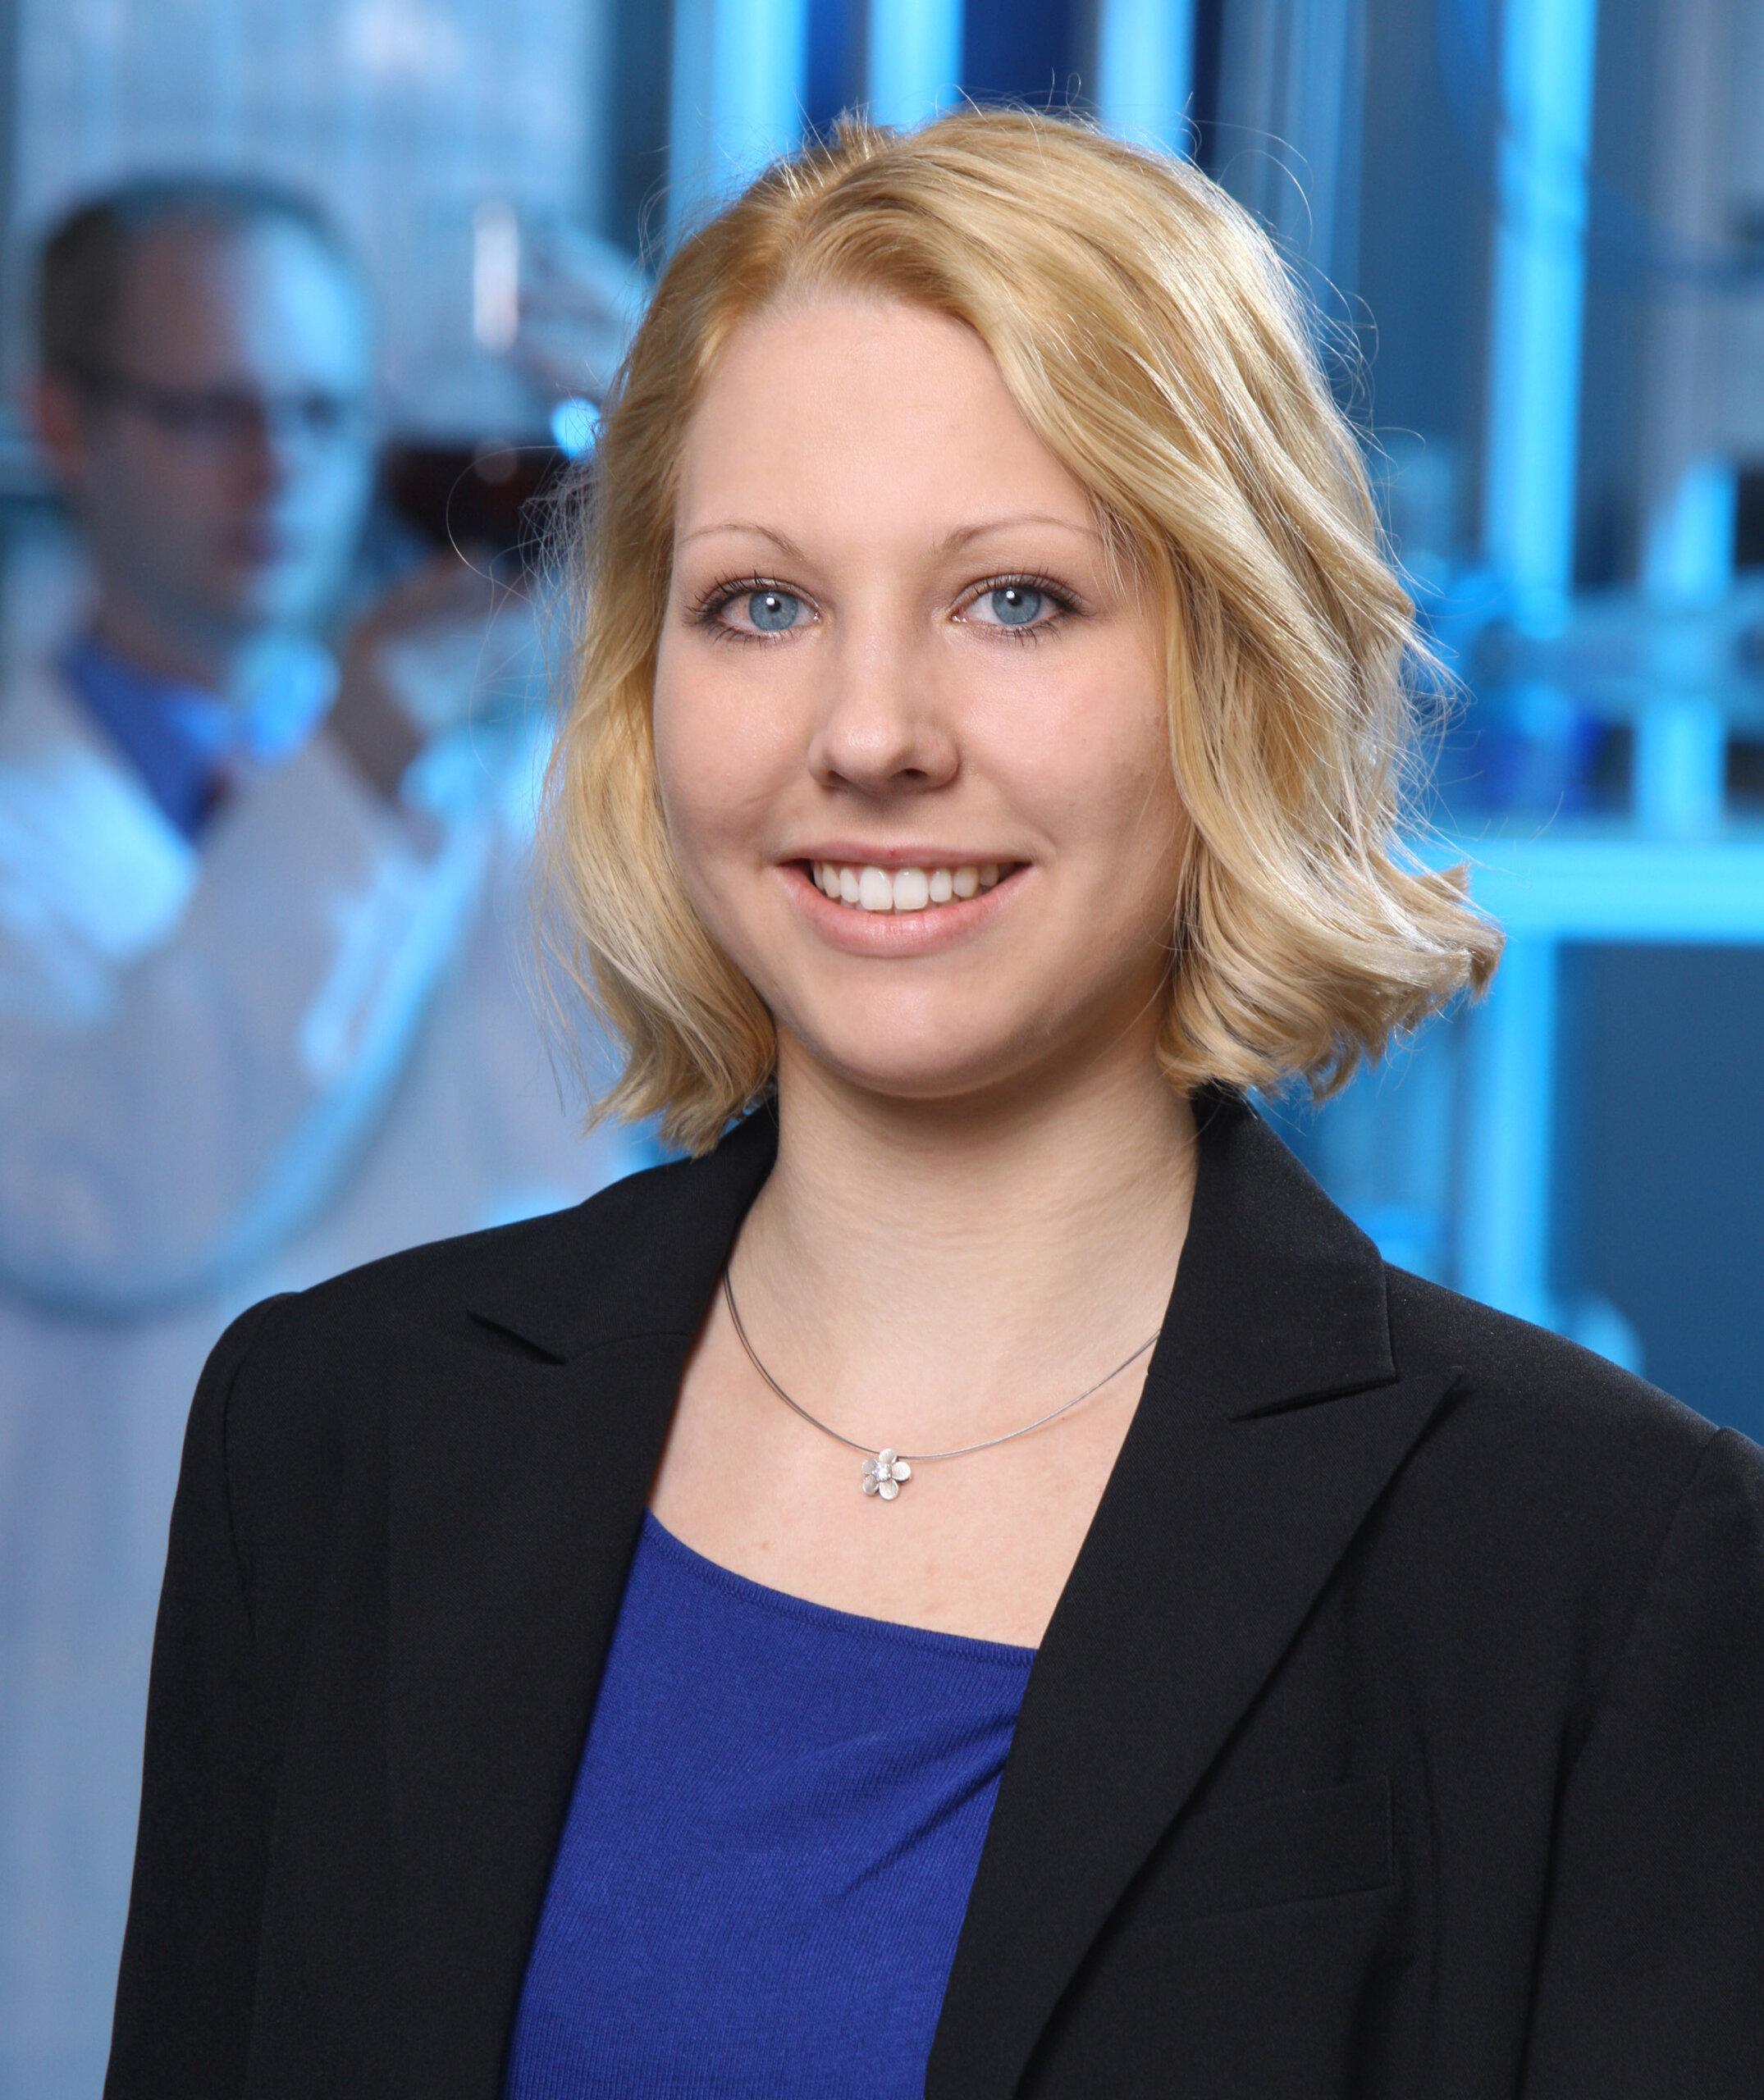 Veronika Wilk Profilbild